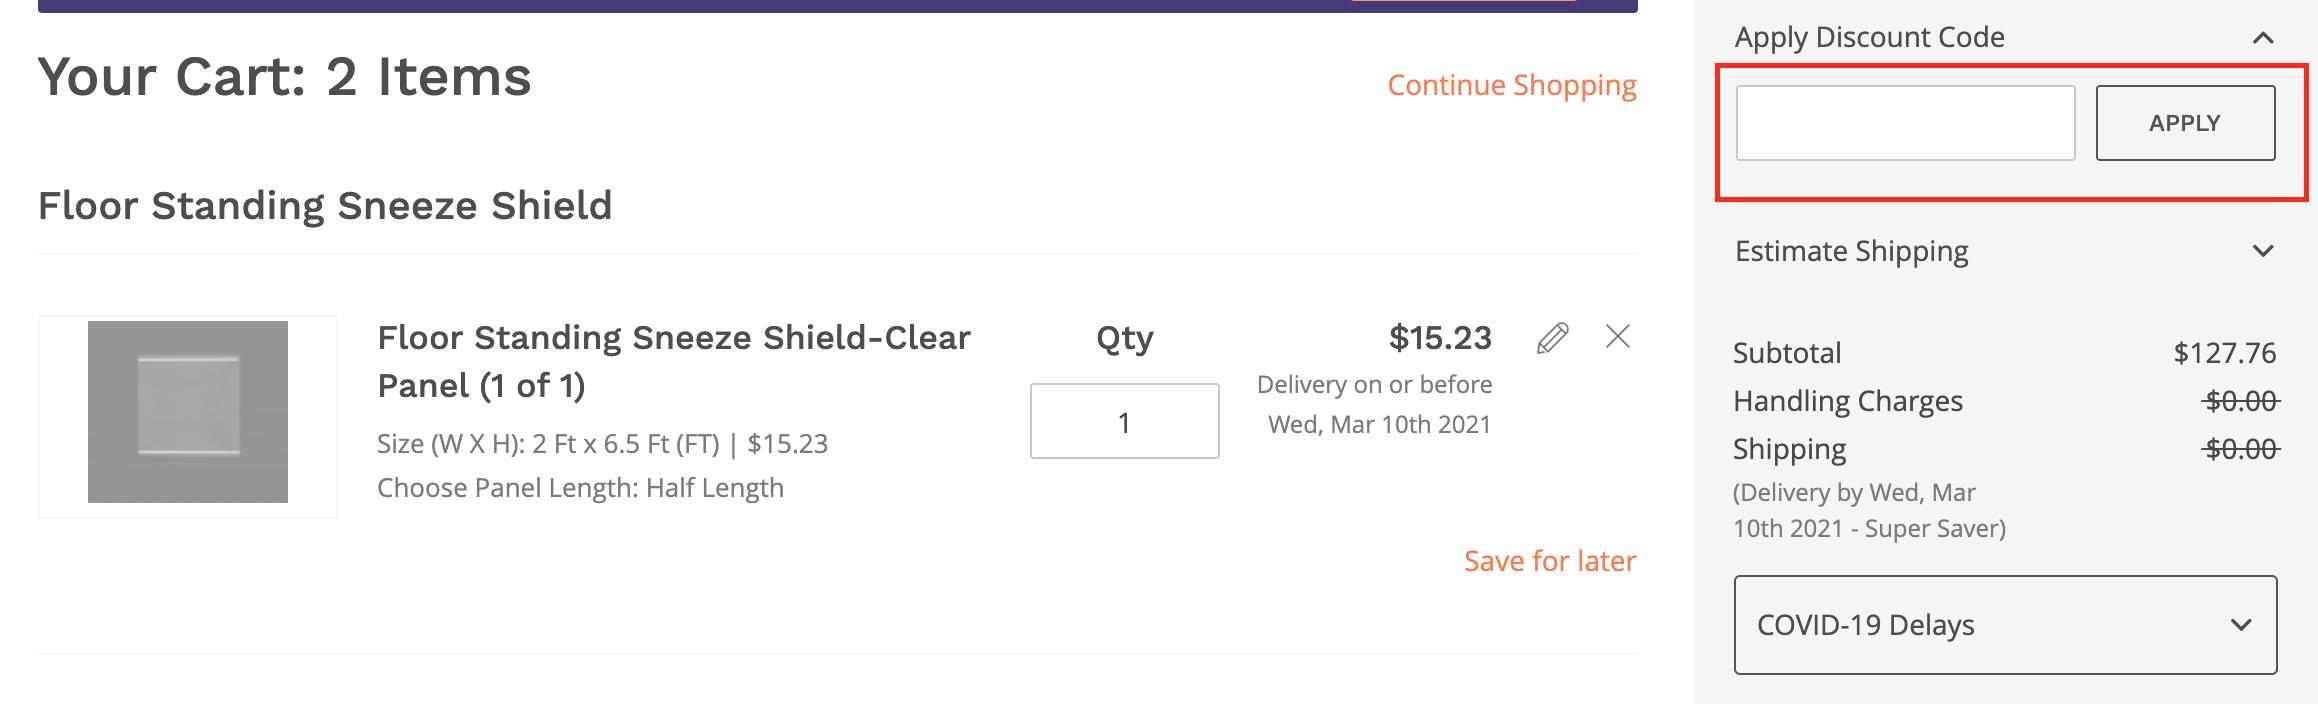 BannerBuzz Discount Code